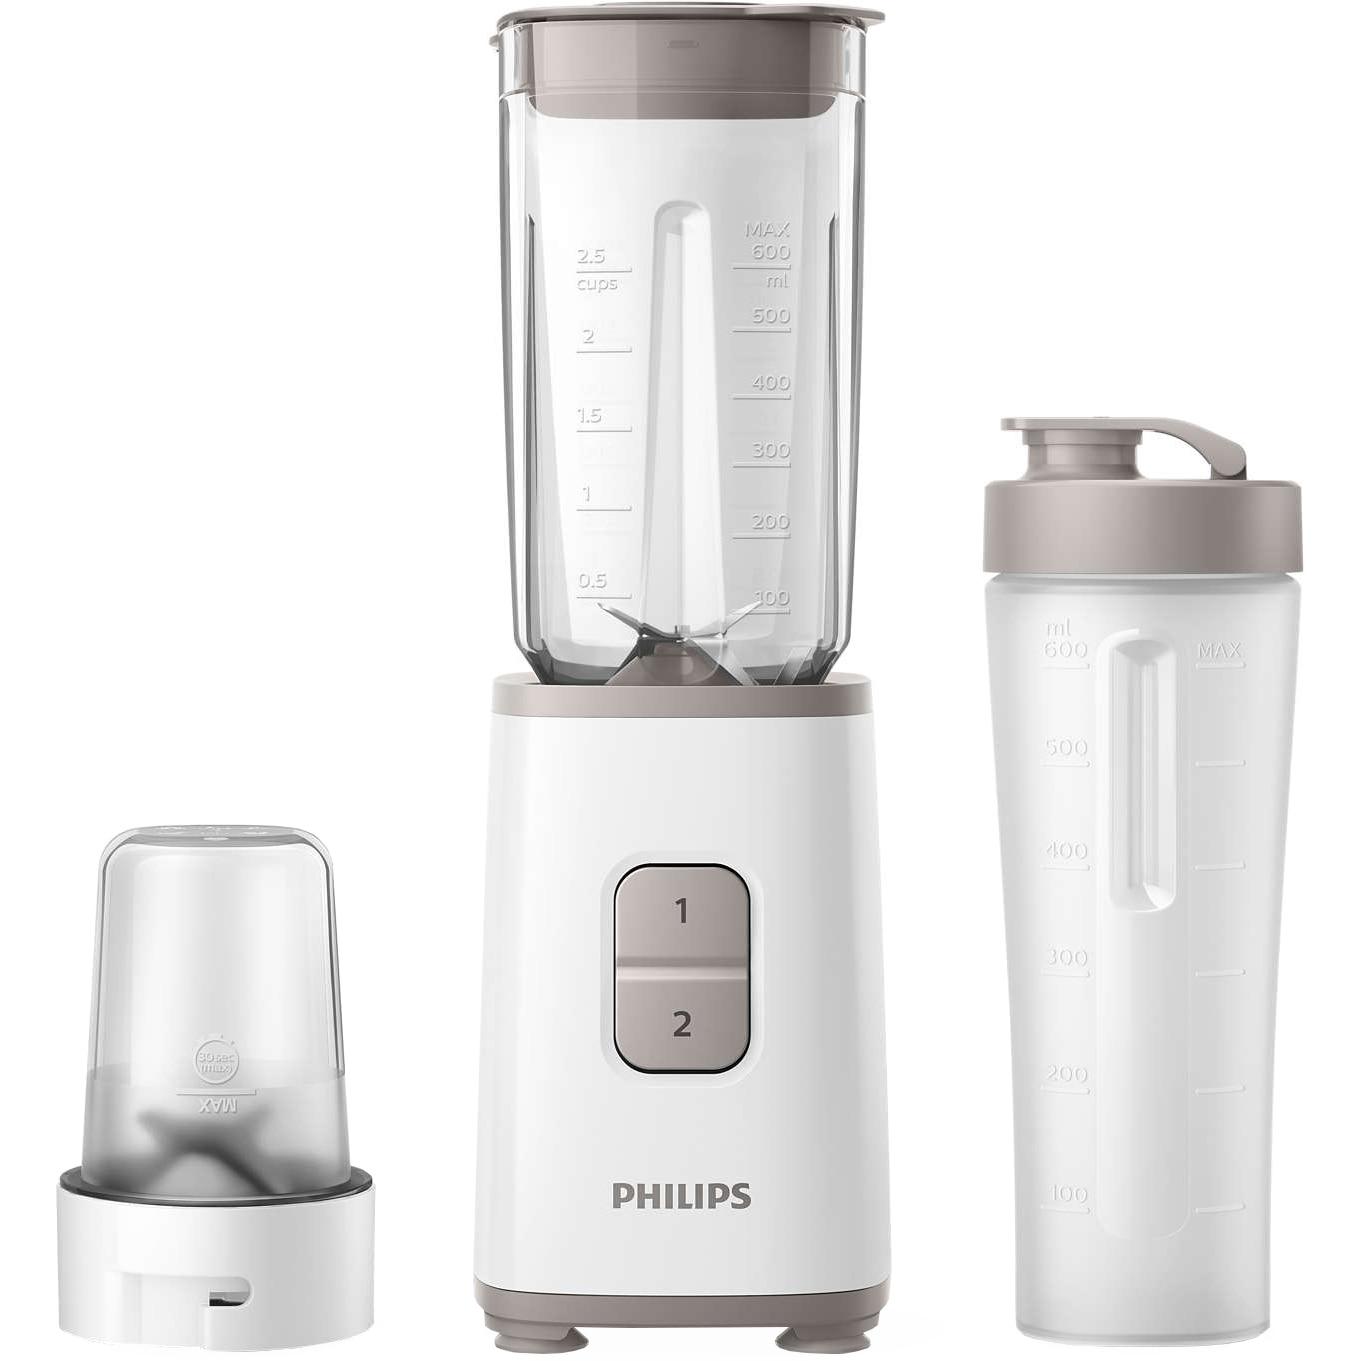 Fotografie Mini blender Philips HR2603/00, 350 W, 1 L, 2 viteze, recipient on-the-go, multitocator, Alb